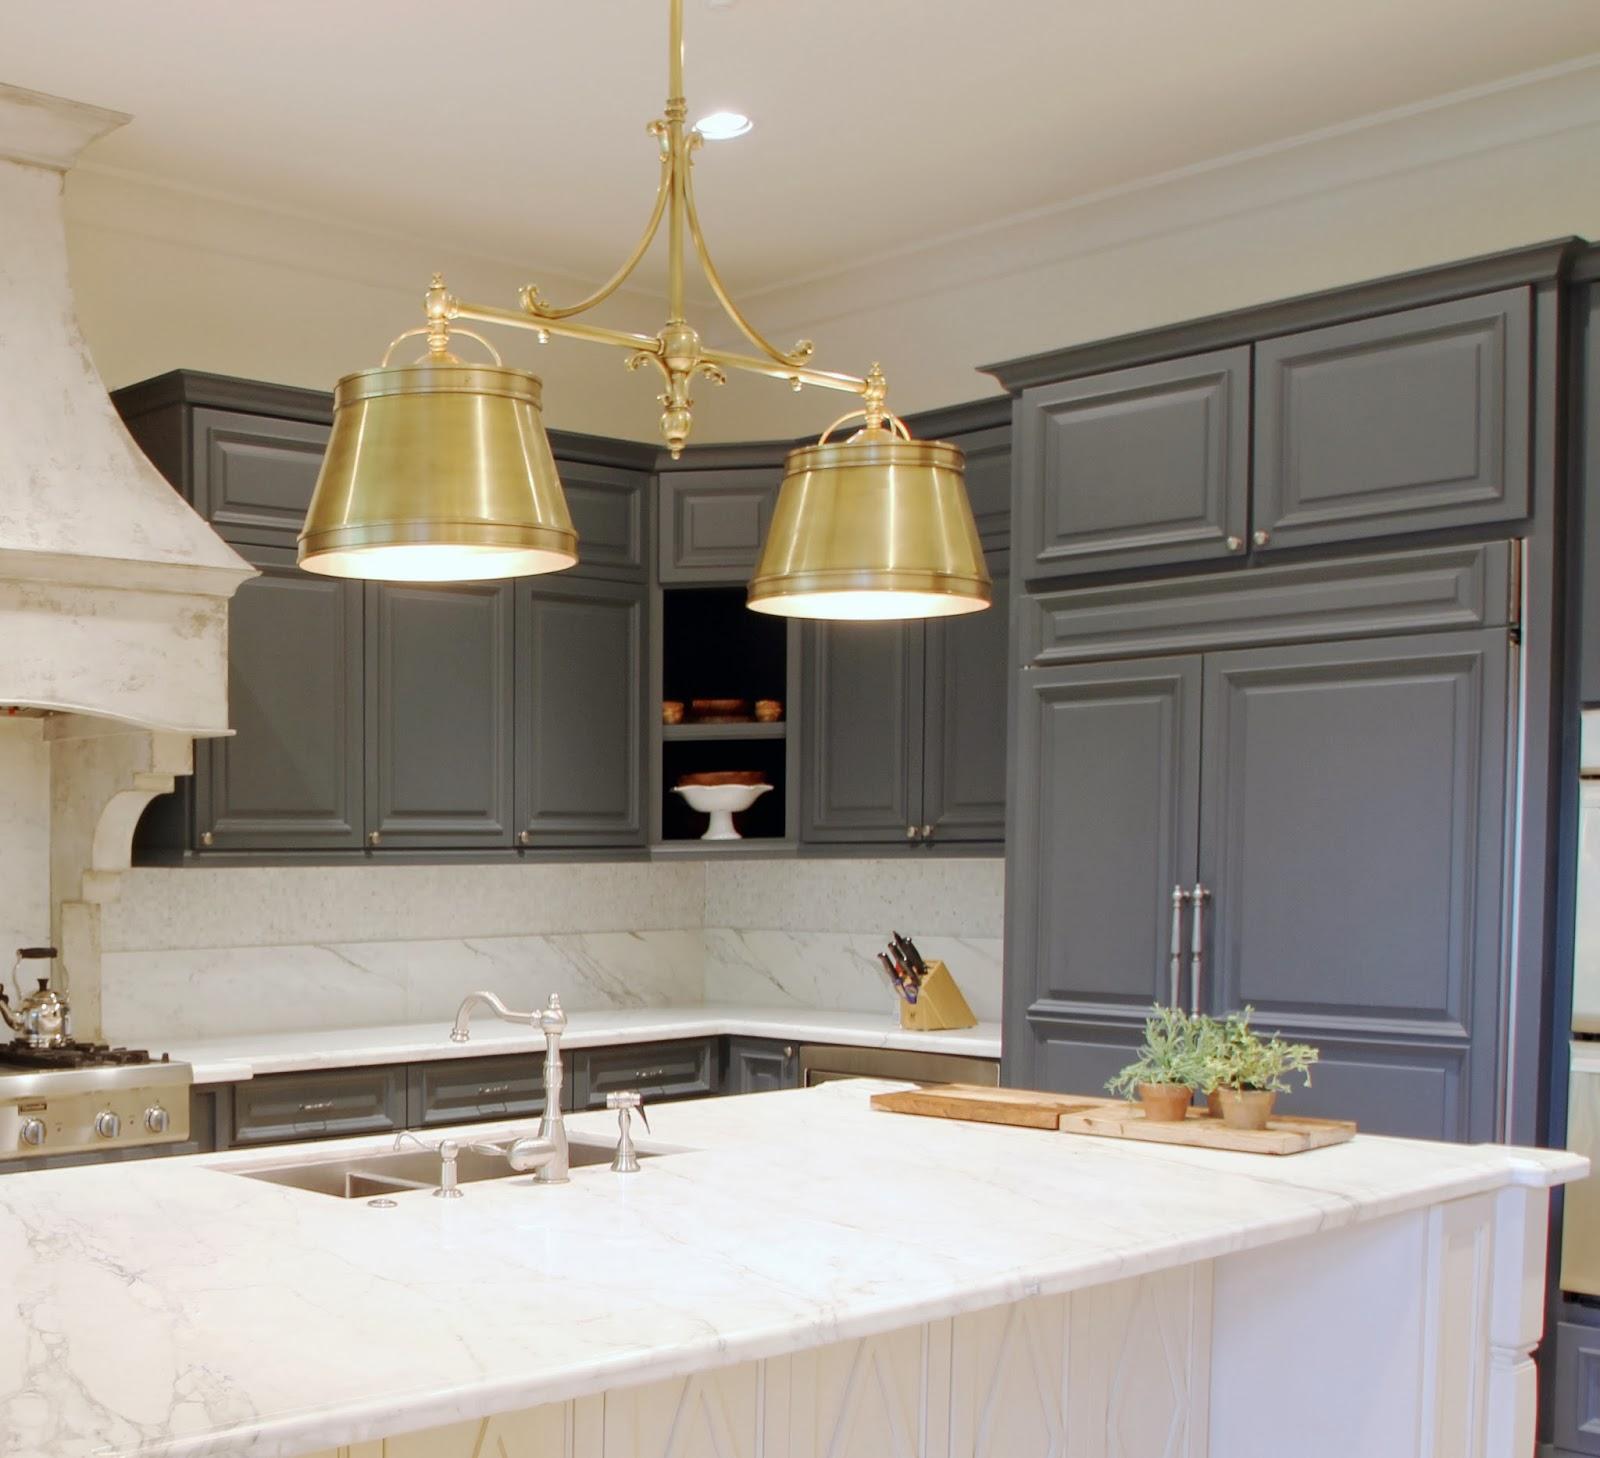 Mfi Kitchen Cabinets: Marie Flanigan Interiors